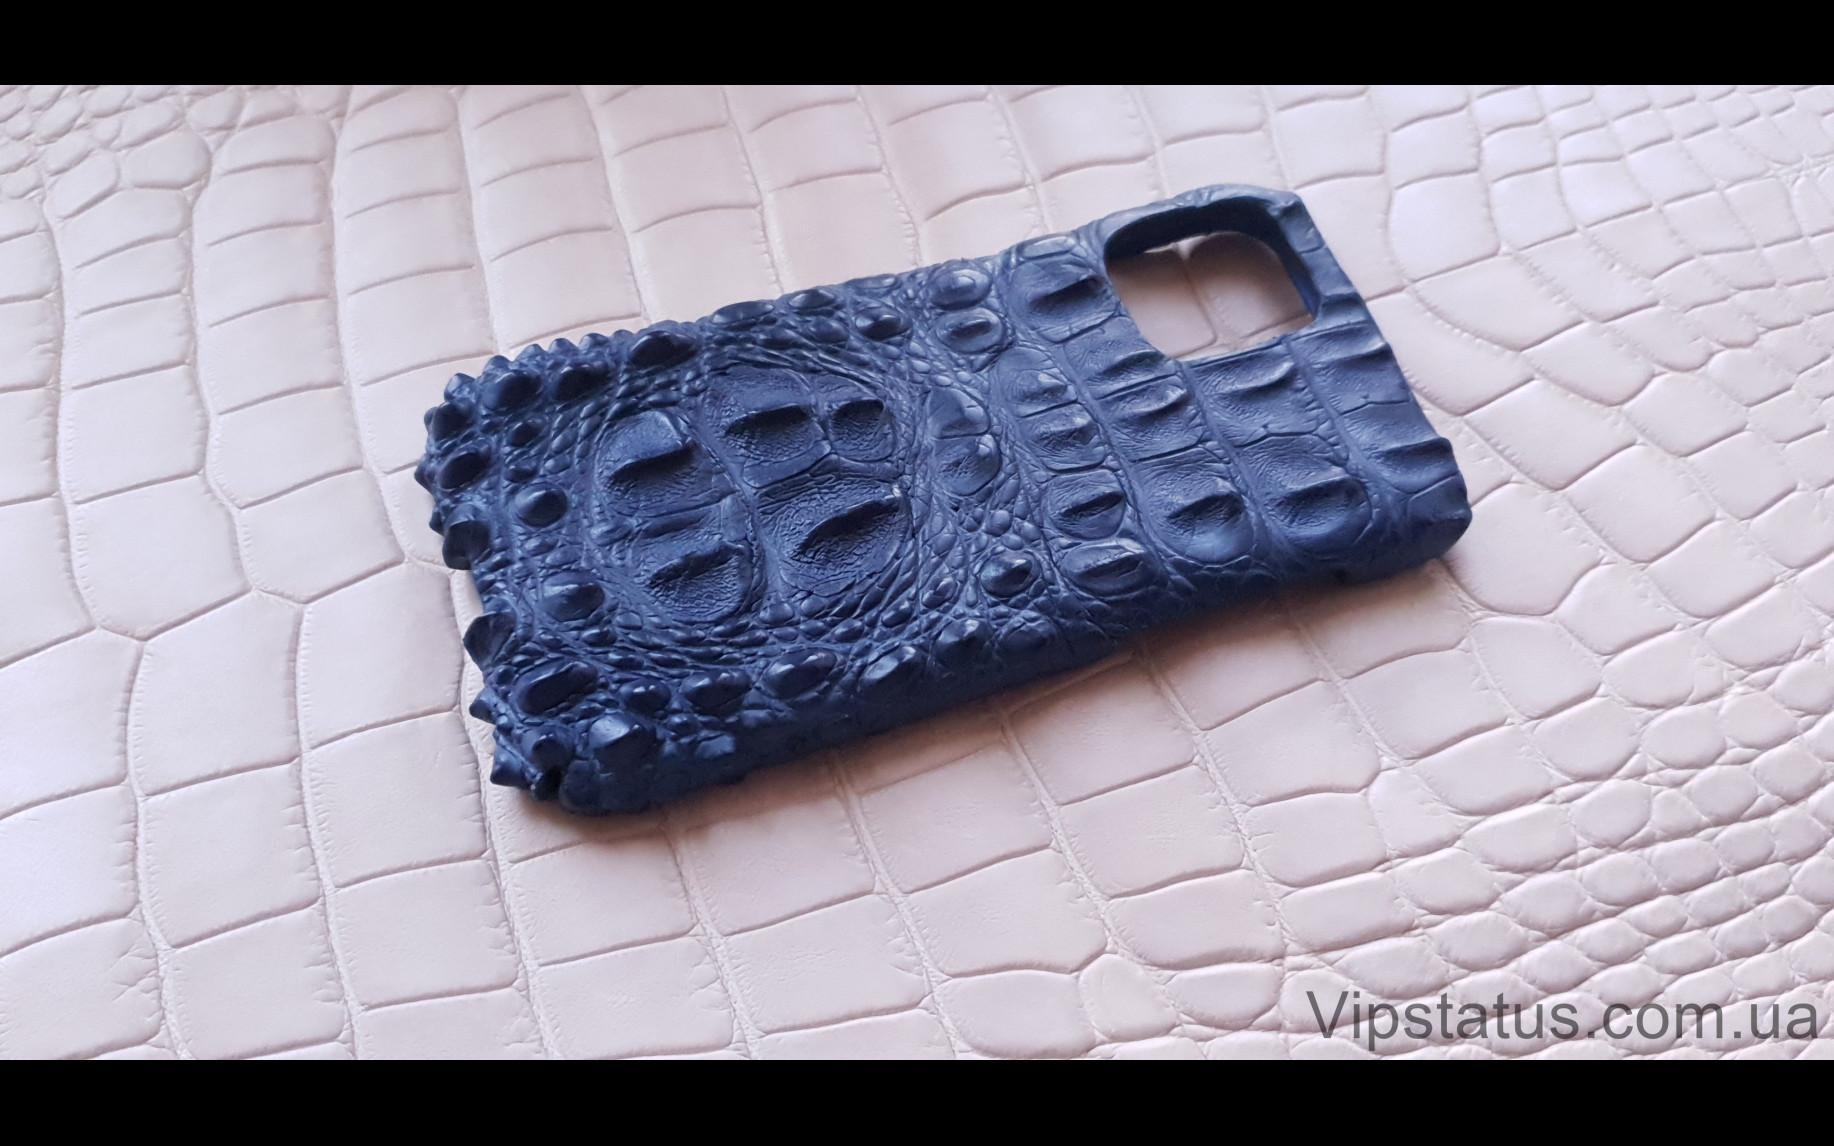 Elite Blue King Премиум чехол IPhone 11 12 Pro Max кожа крокодила Blue King Premium case IPhone 11 12 Pro Max Crocodile leather image 1